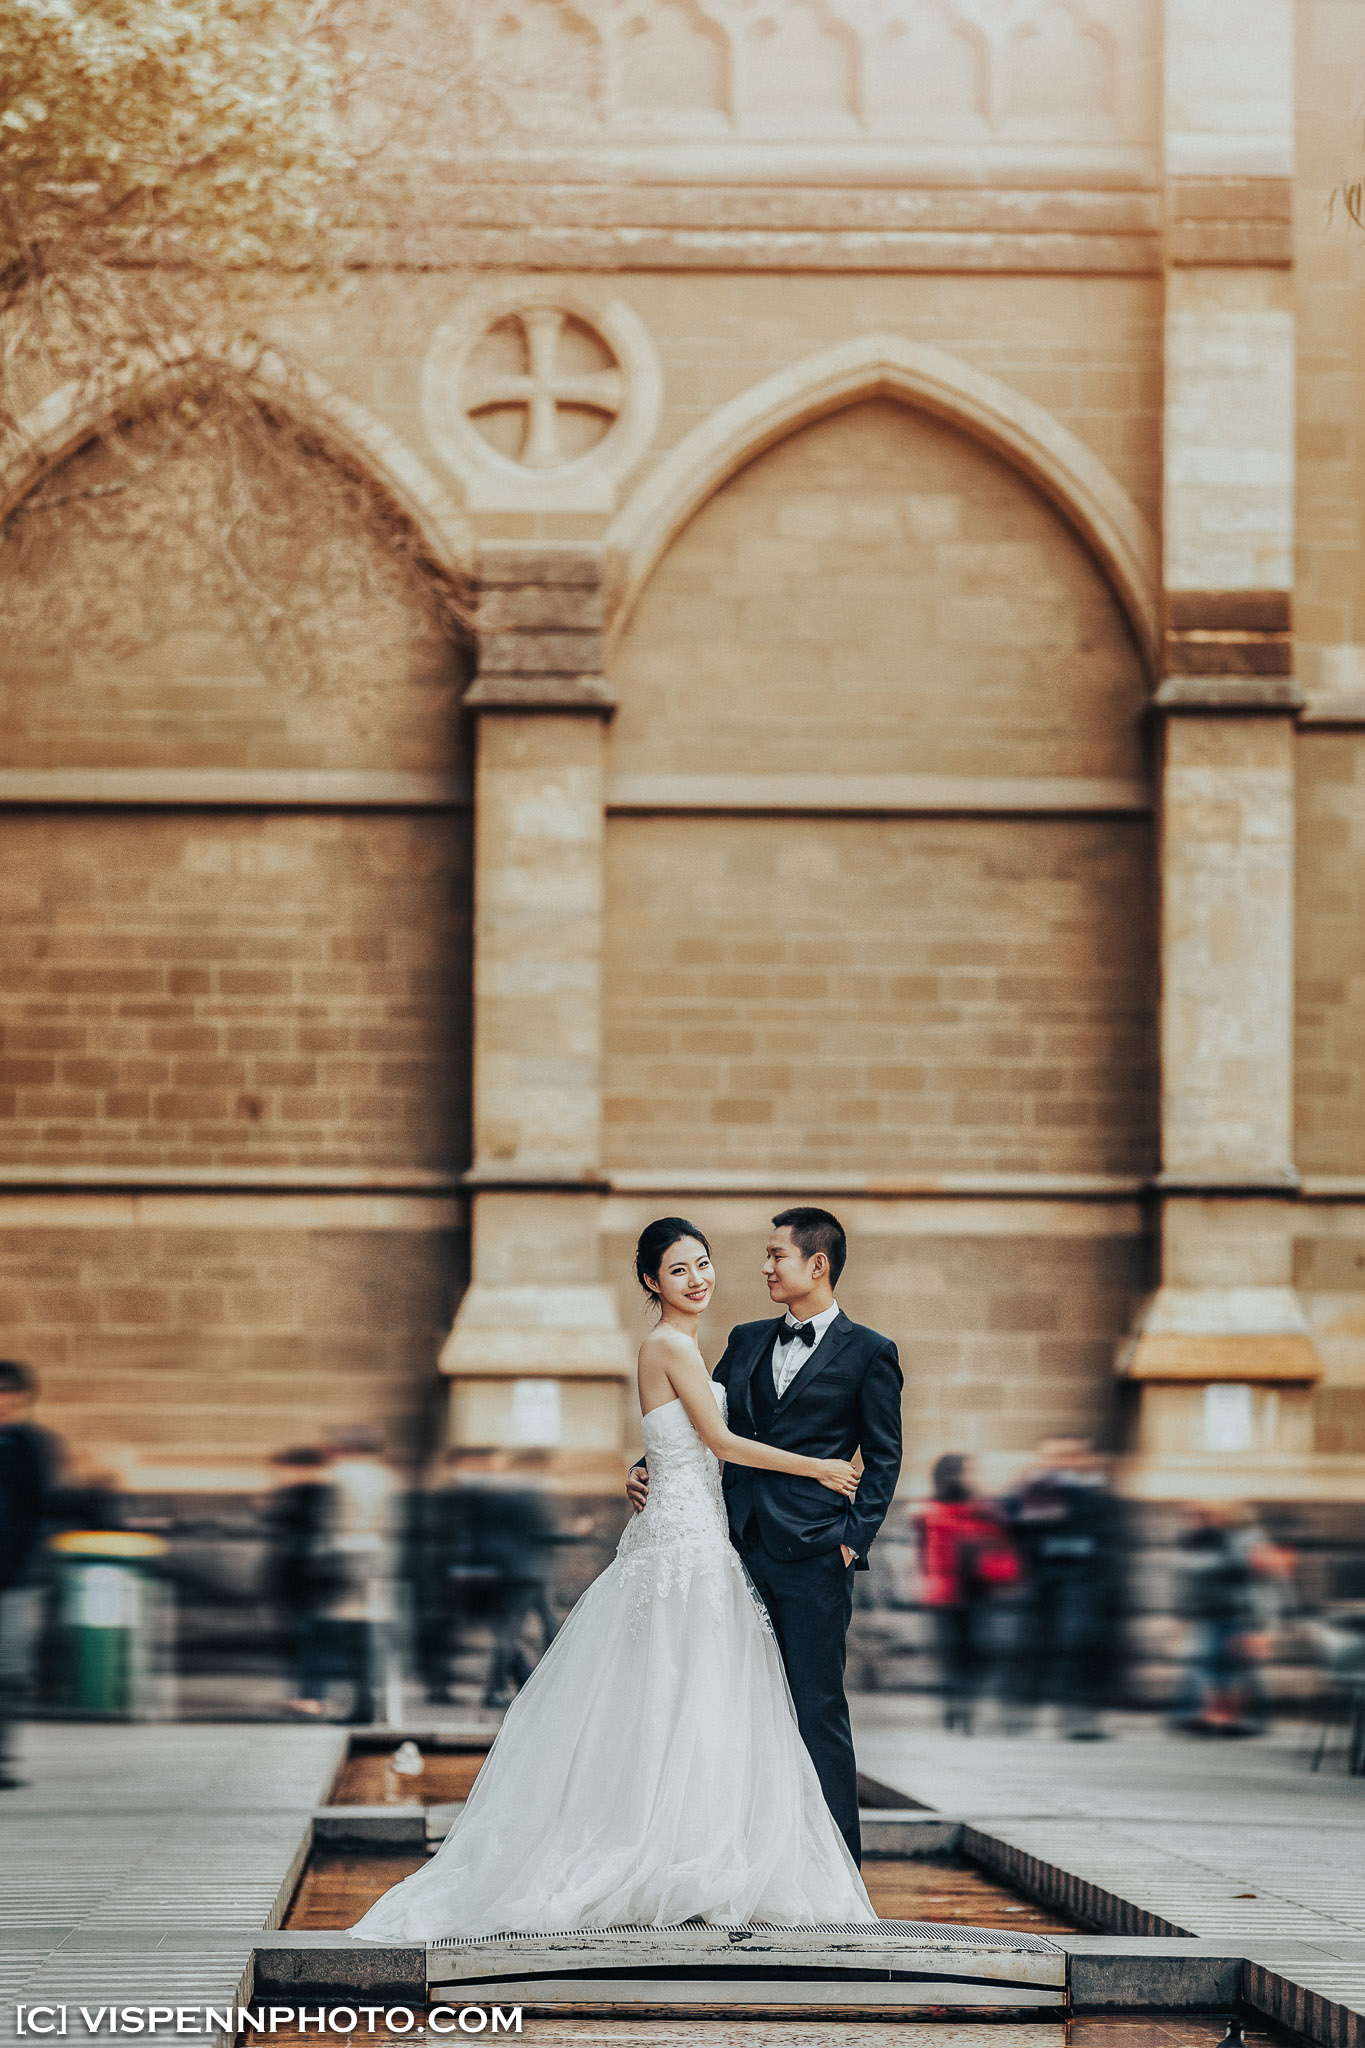 PRE WEDDING Photography Melbourne VISPENN 墨尔本 婚纱照 结婚照 婚纱摄影 Stella PreWedding 4177 1